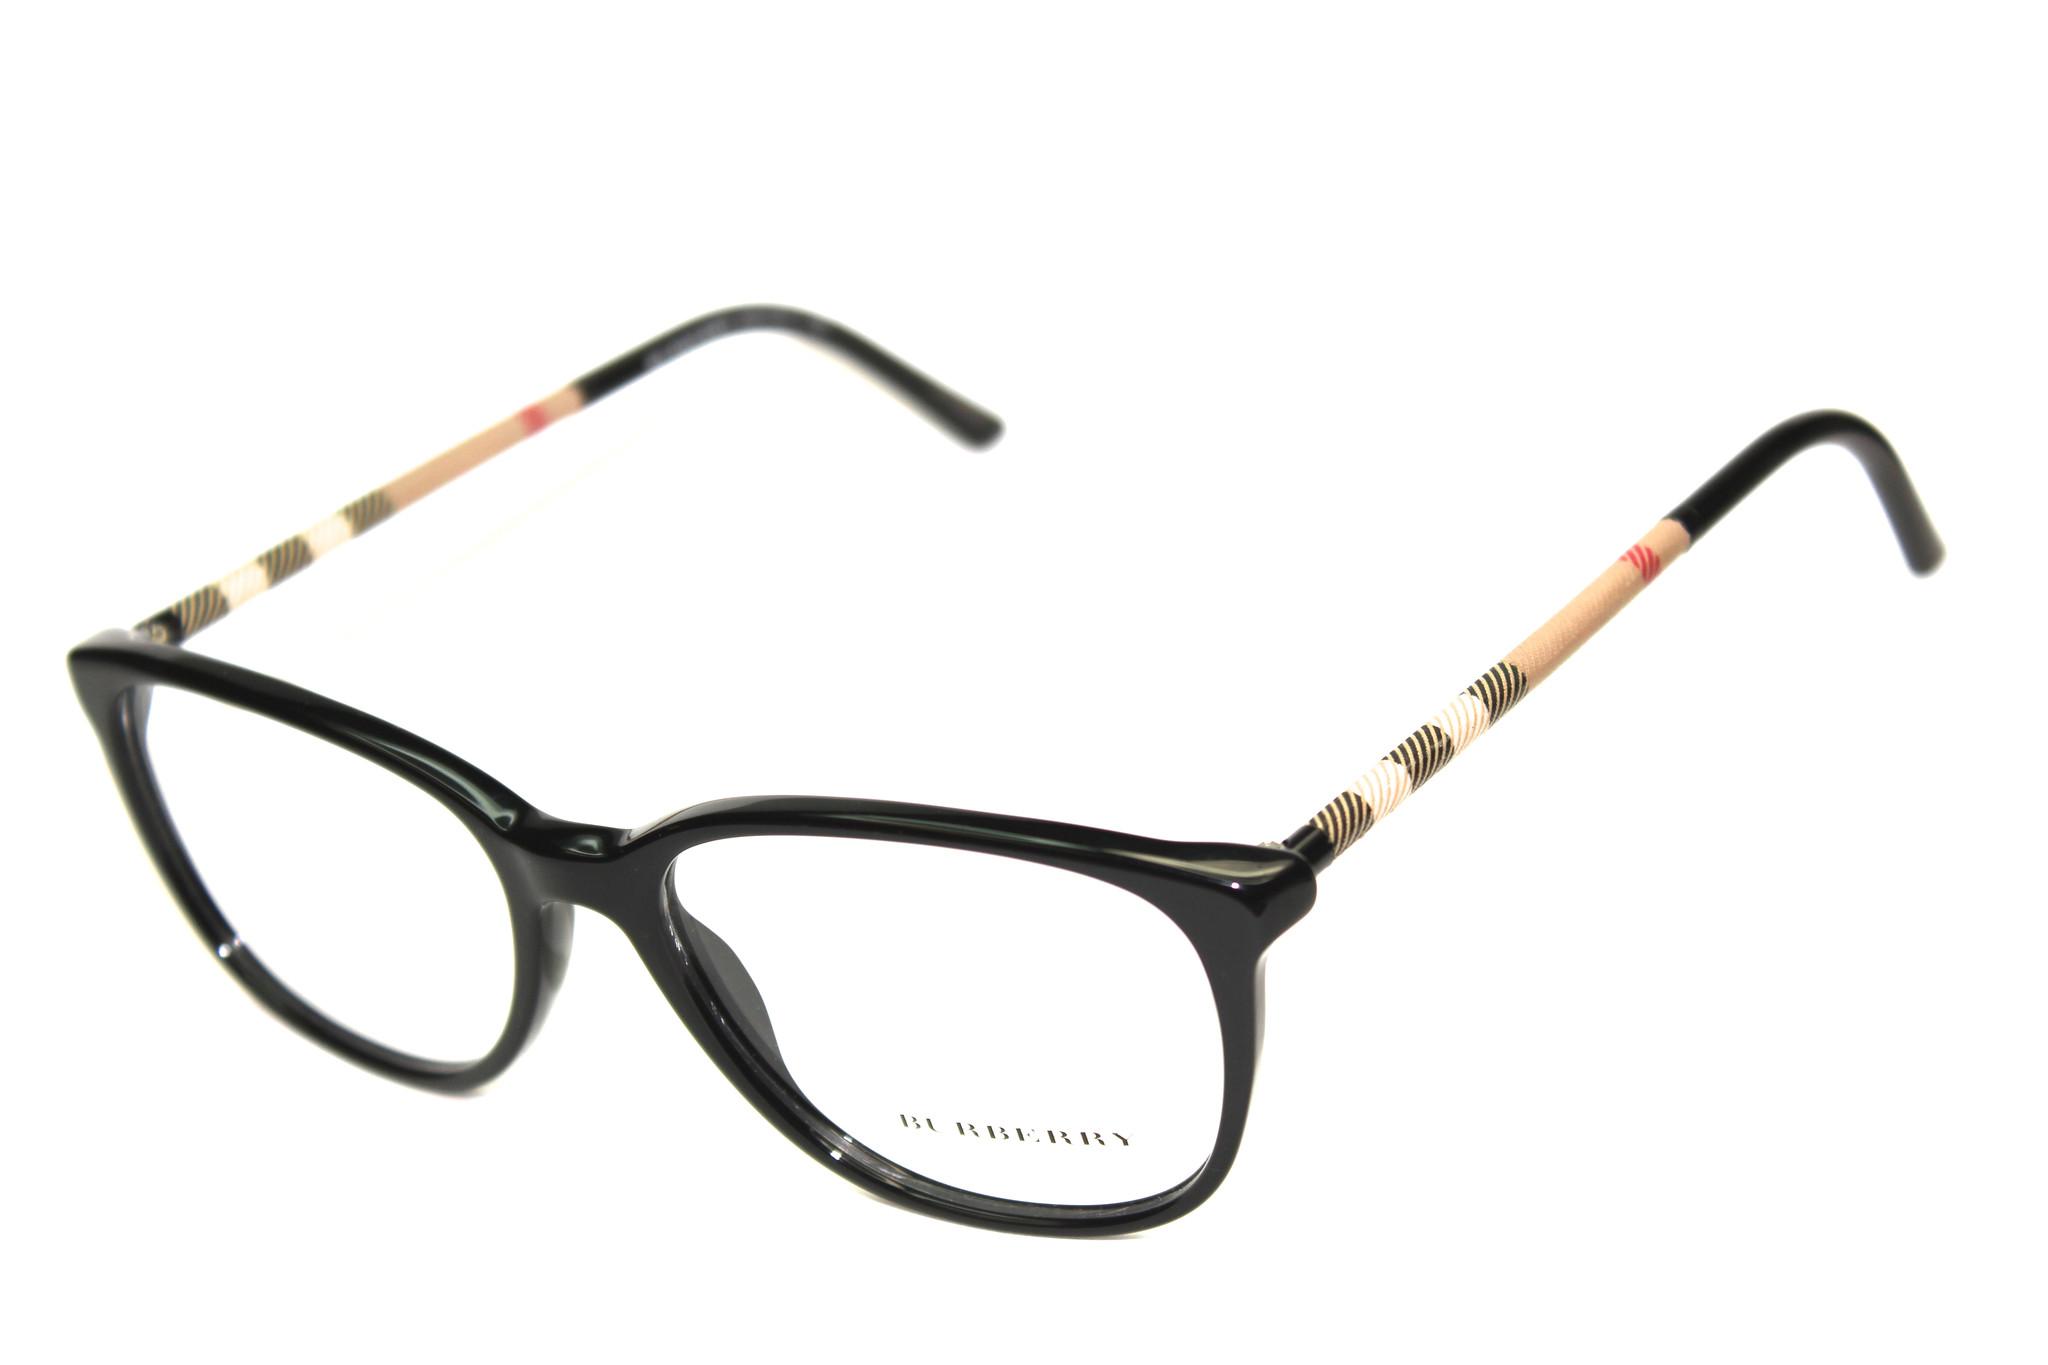 Burberry womens eyeglasses.jpg